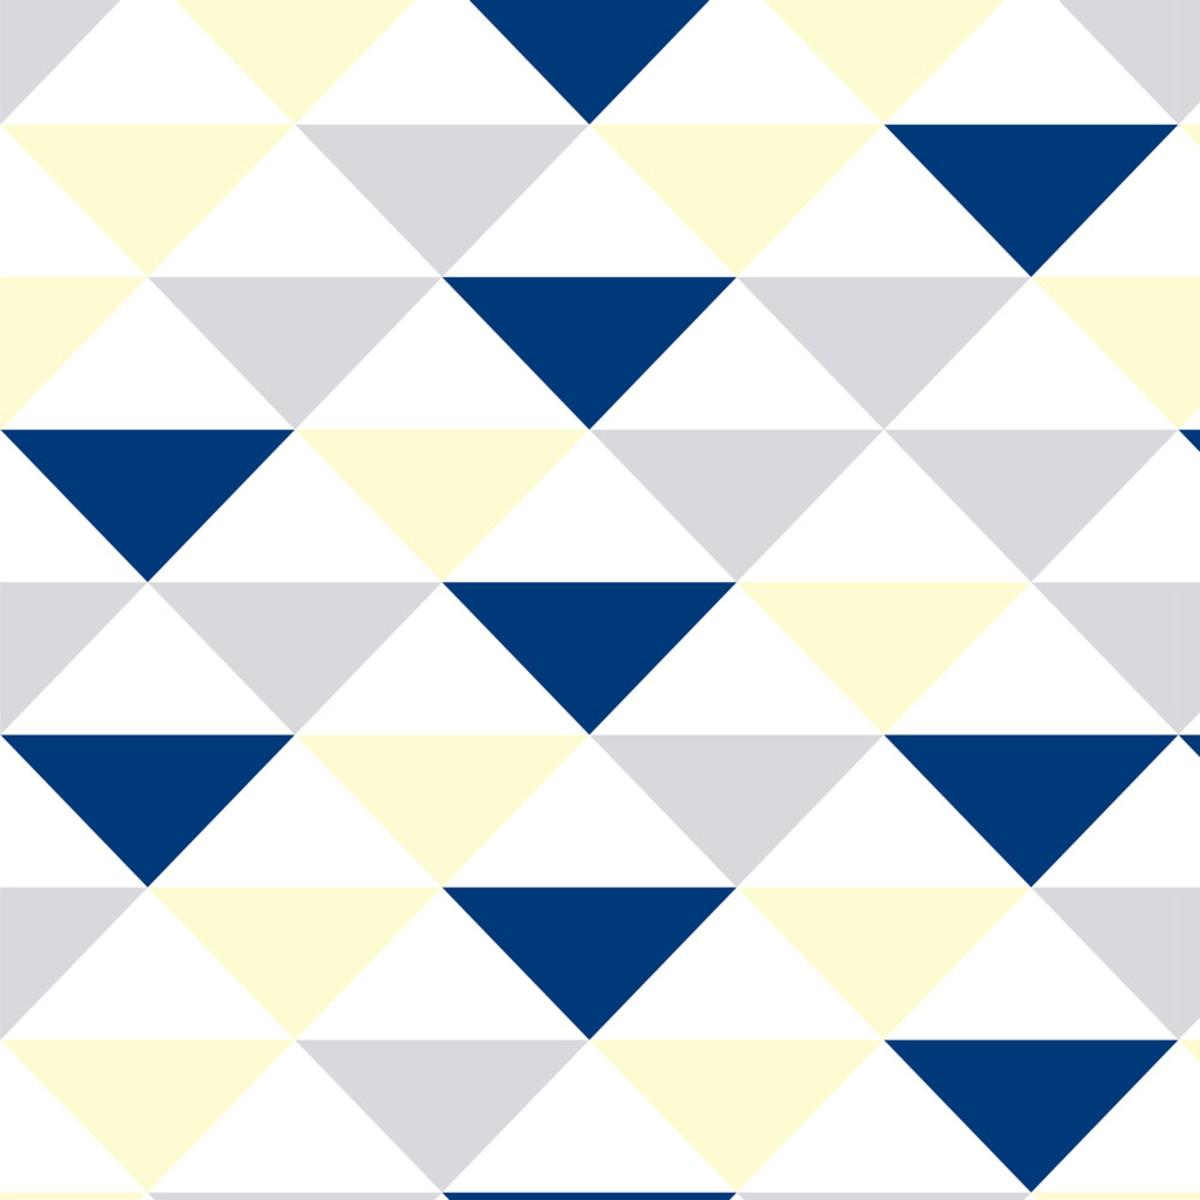 6793d1dcd Papel parede geométrico triângulo azul cinza branco amarelo no elo jpg  1200x1200 Amarelo papel parede geometrico